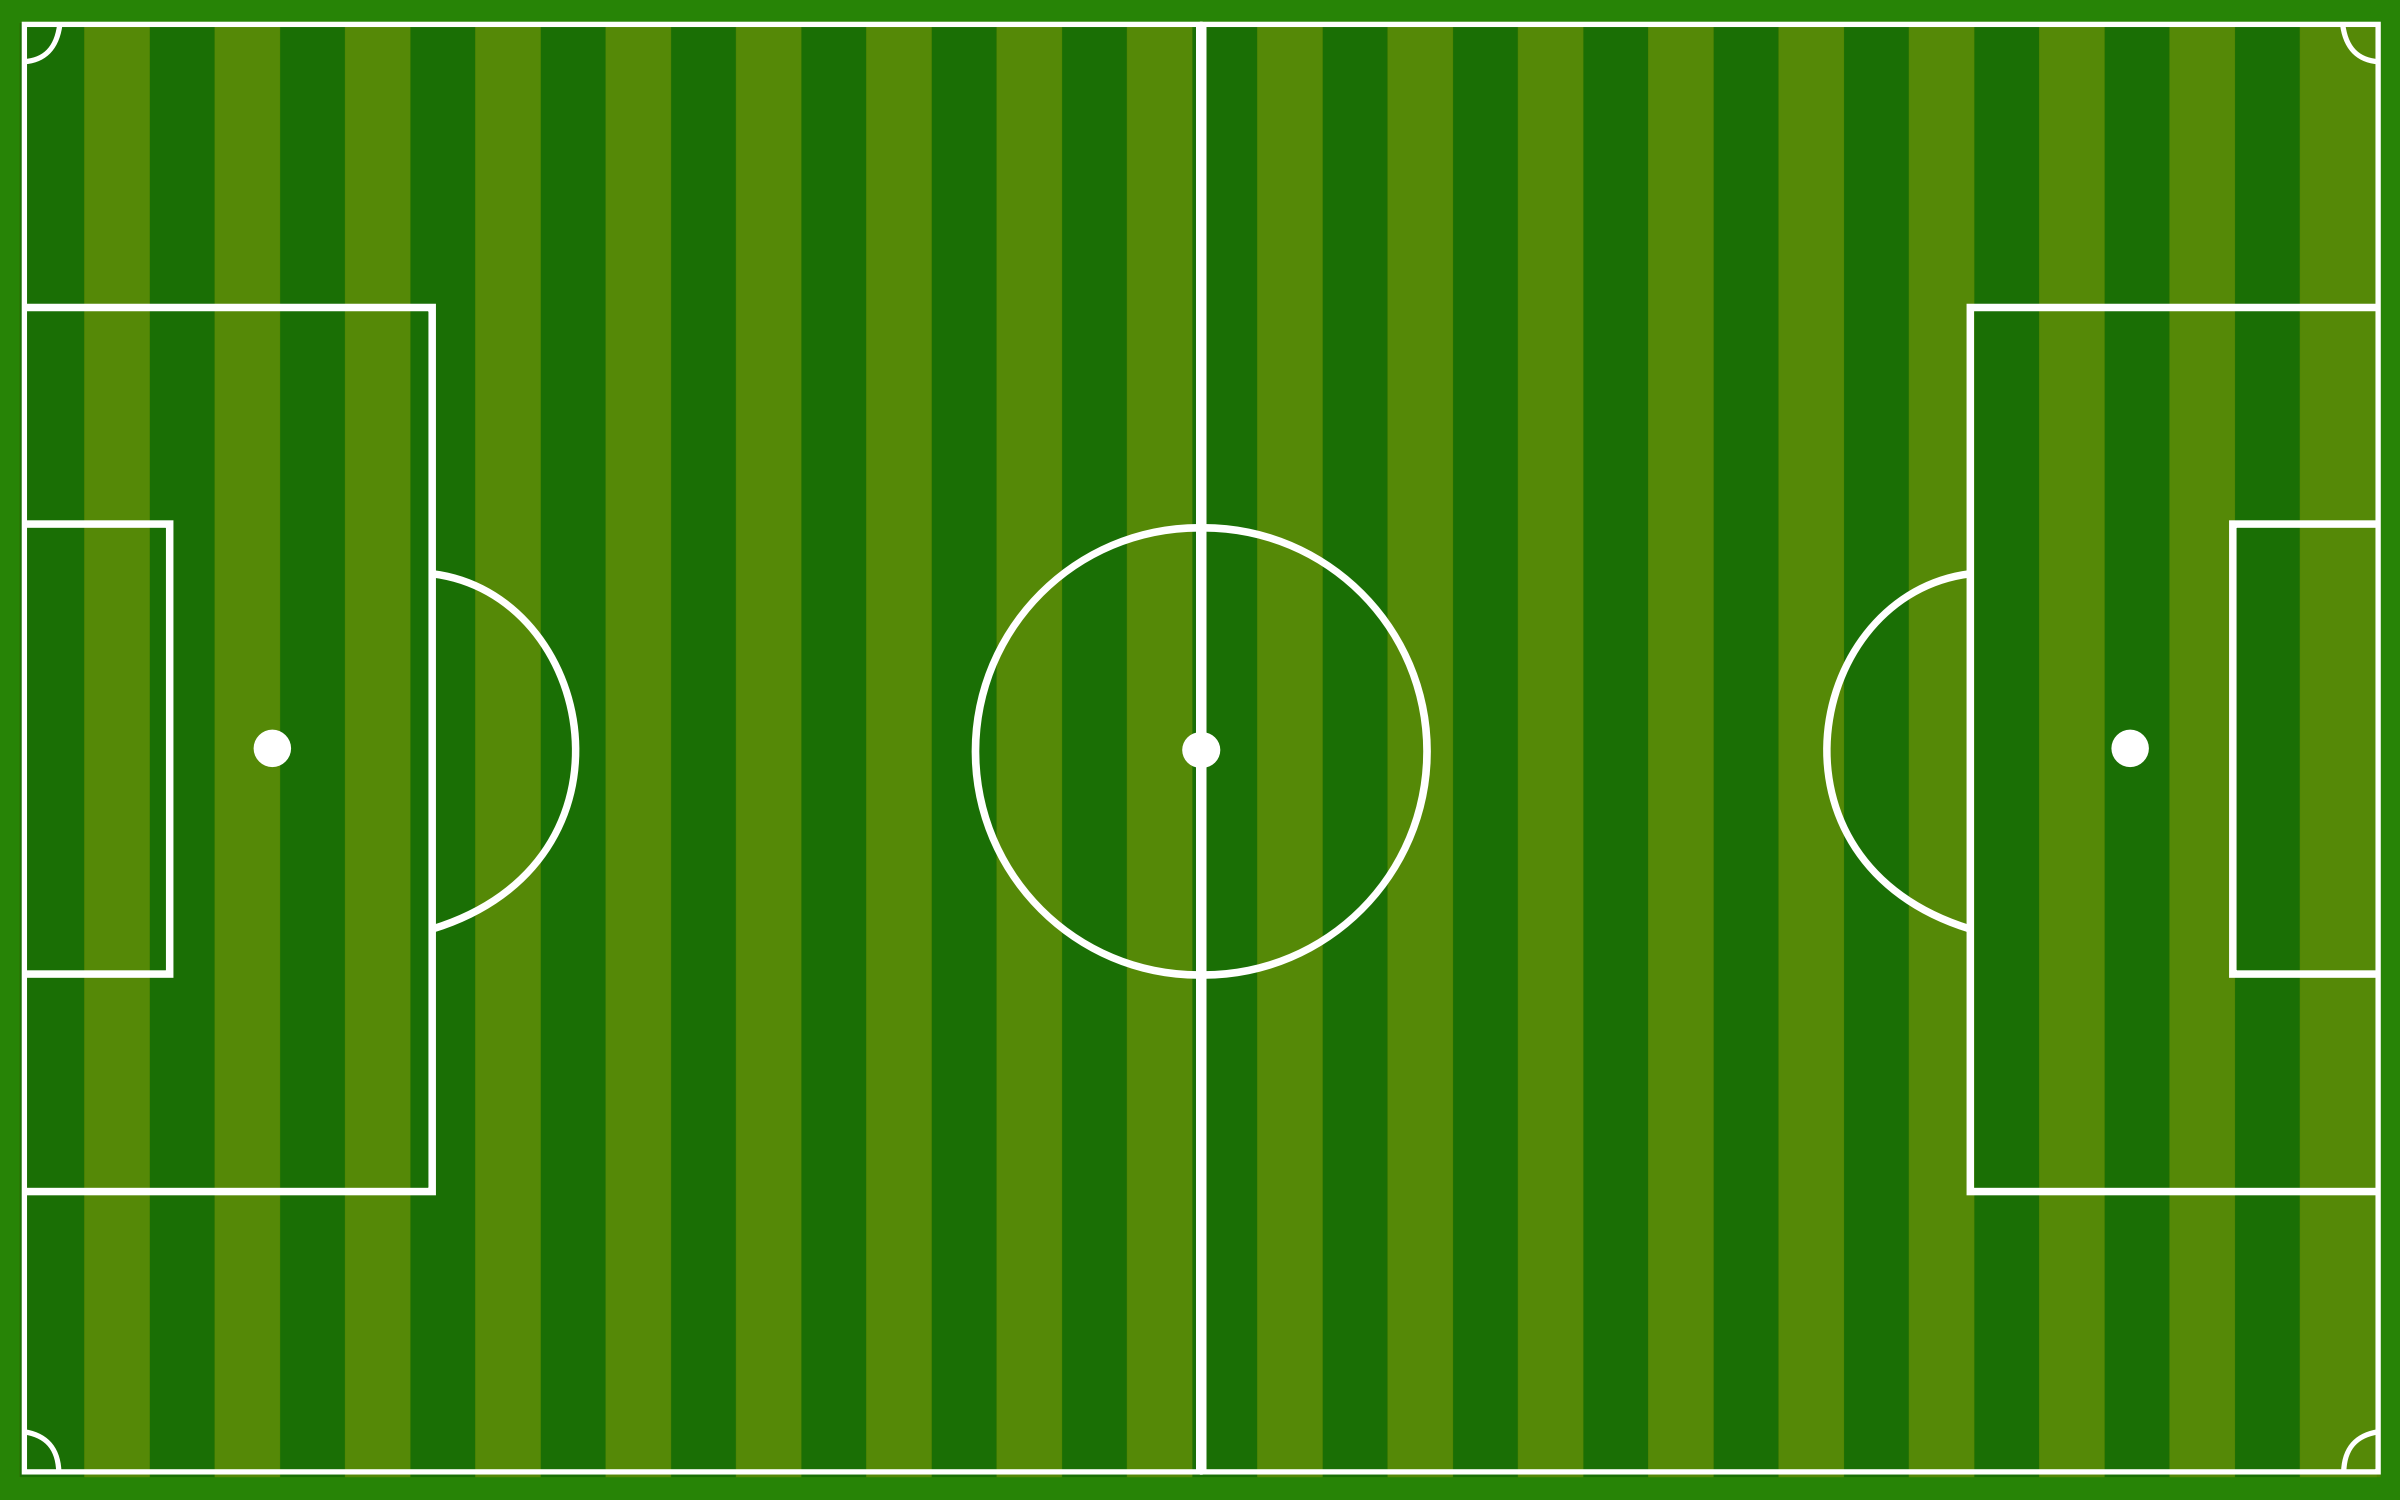 Football field clipart soccer field.